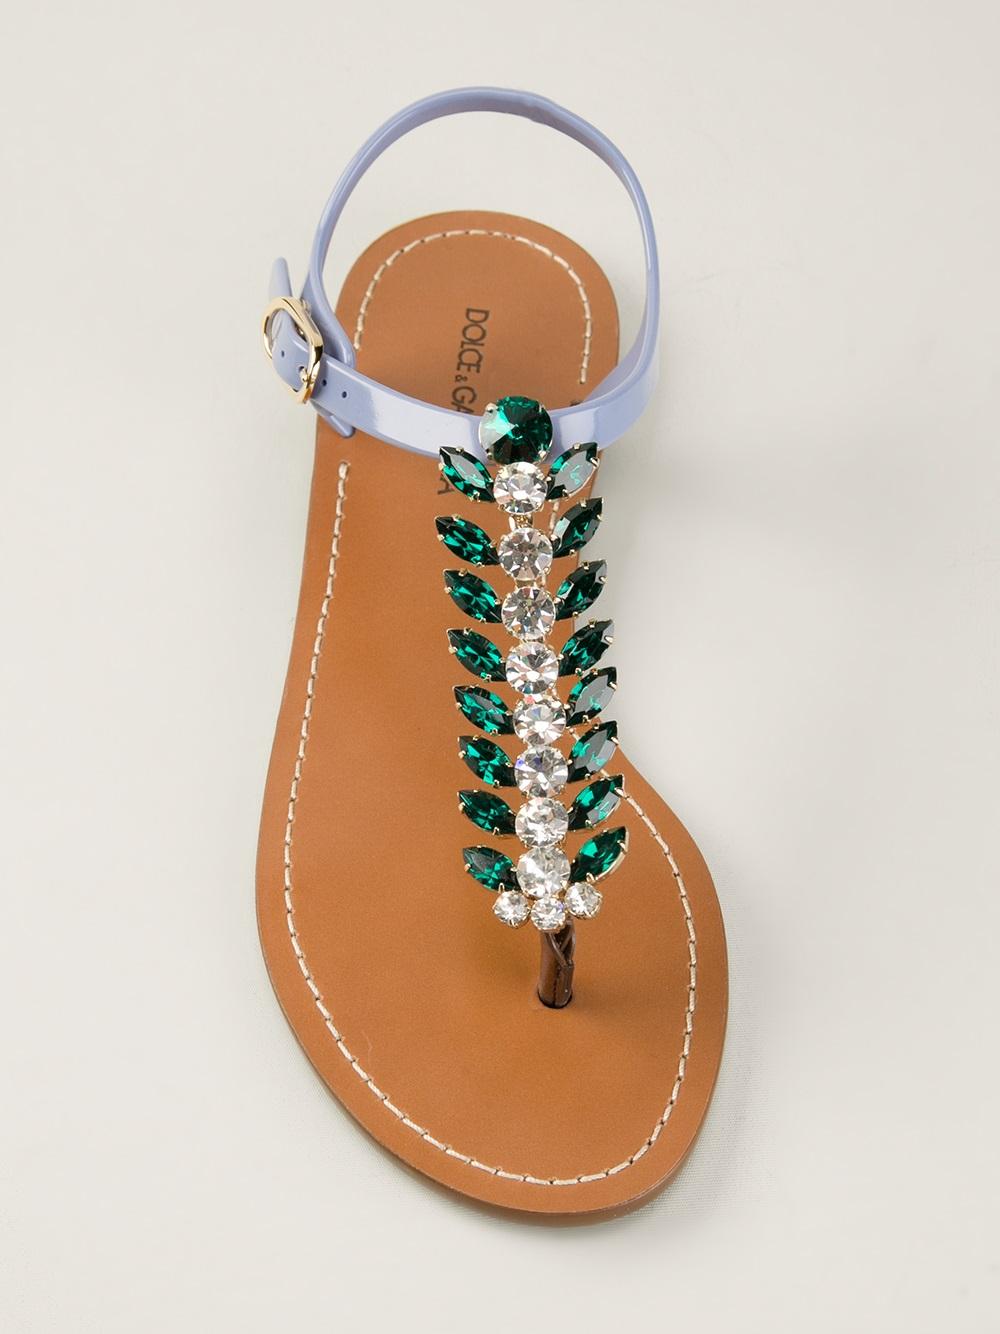 Dolce & Gabbana Sandales Entredoigt J3gpRdI